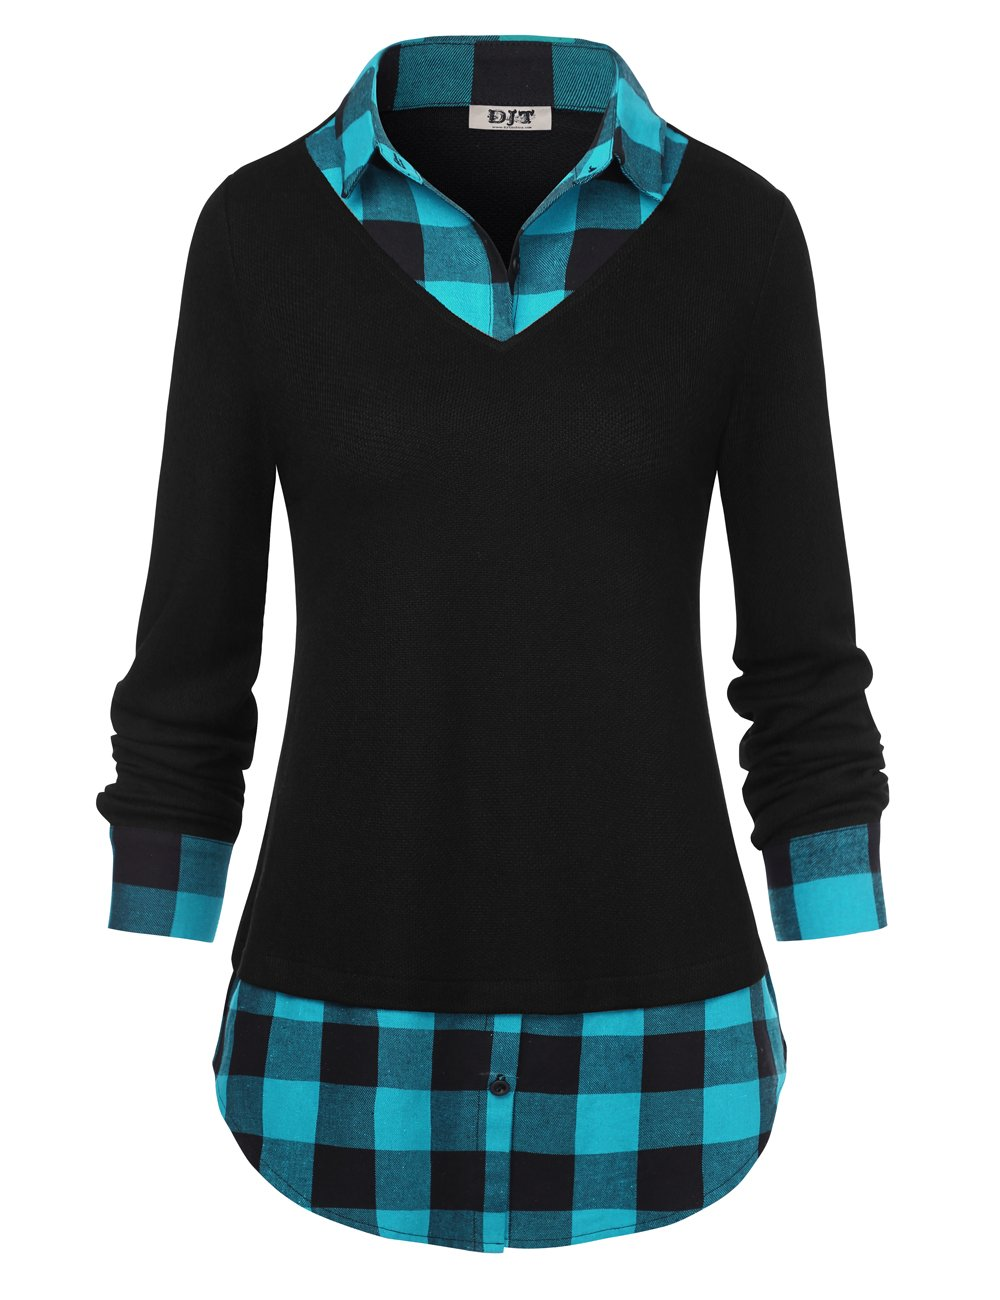 DJT FASHION Women's Plaid Layered T-Shirt, Curved Hem Buttons Pullover Tops 3/4 Sleeve Sweatshirt T-Shirt Top M Blue Plaid